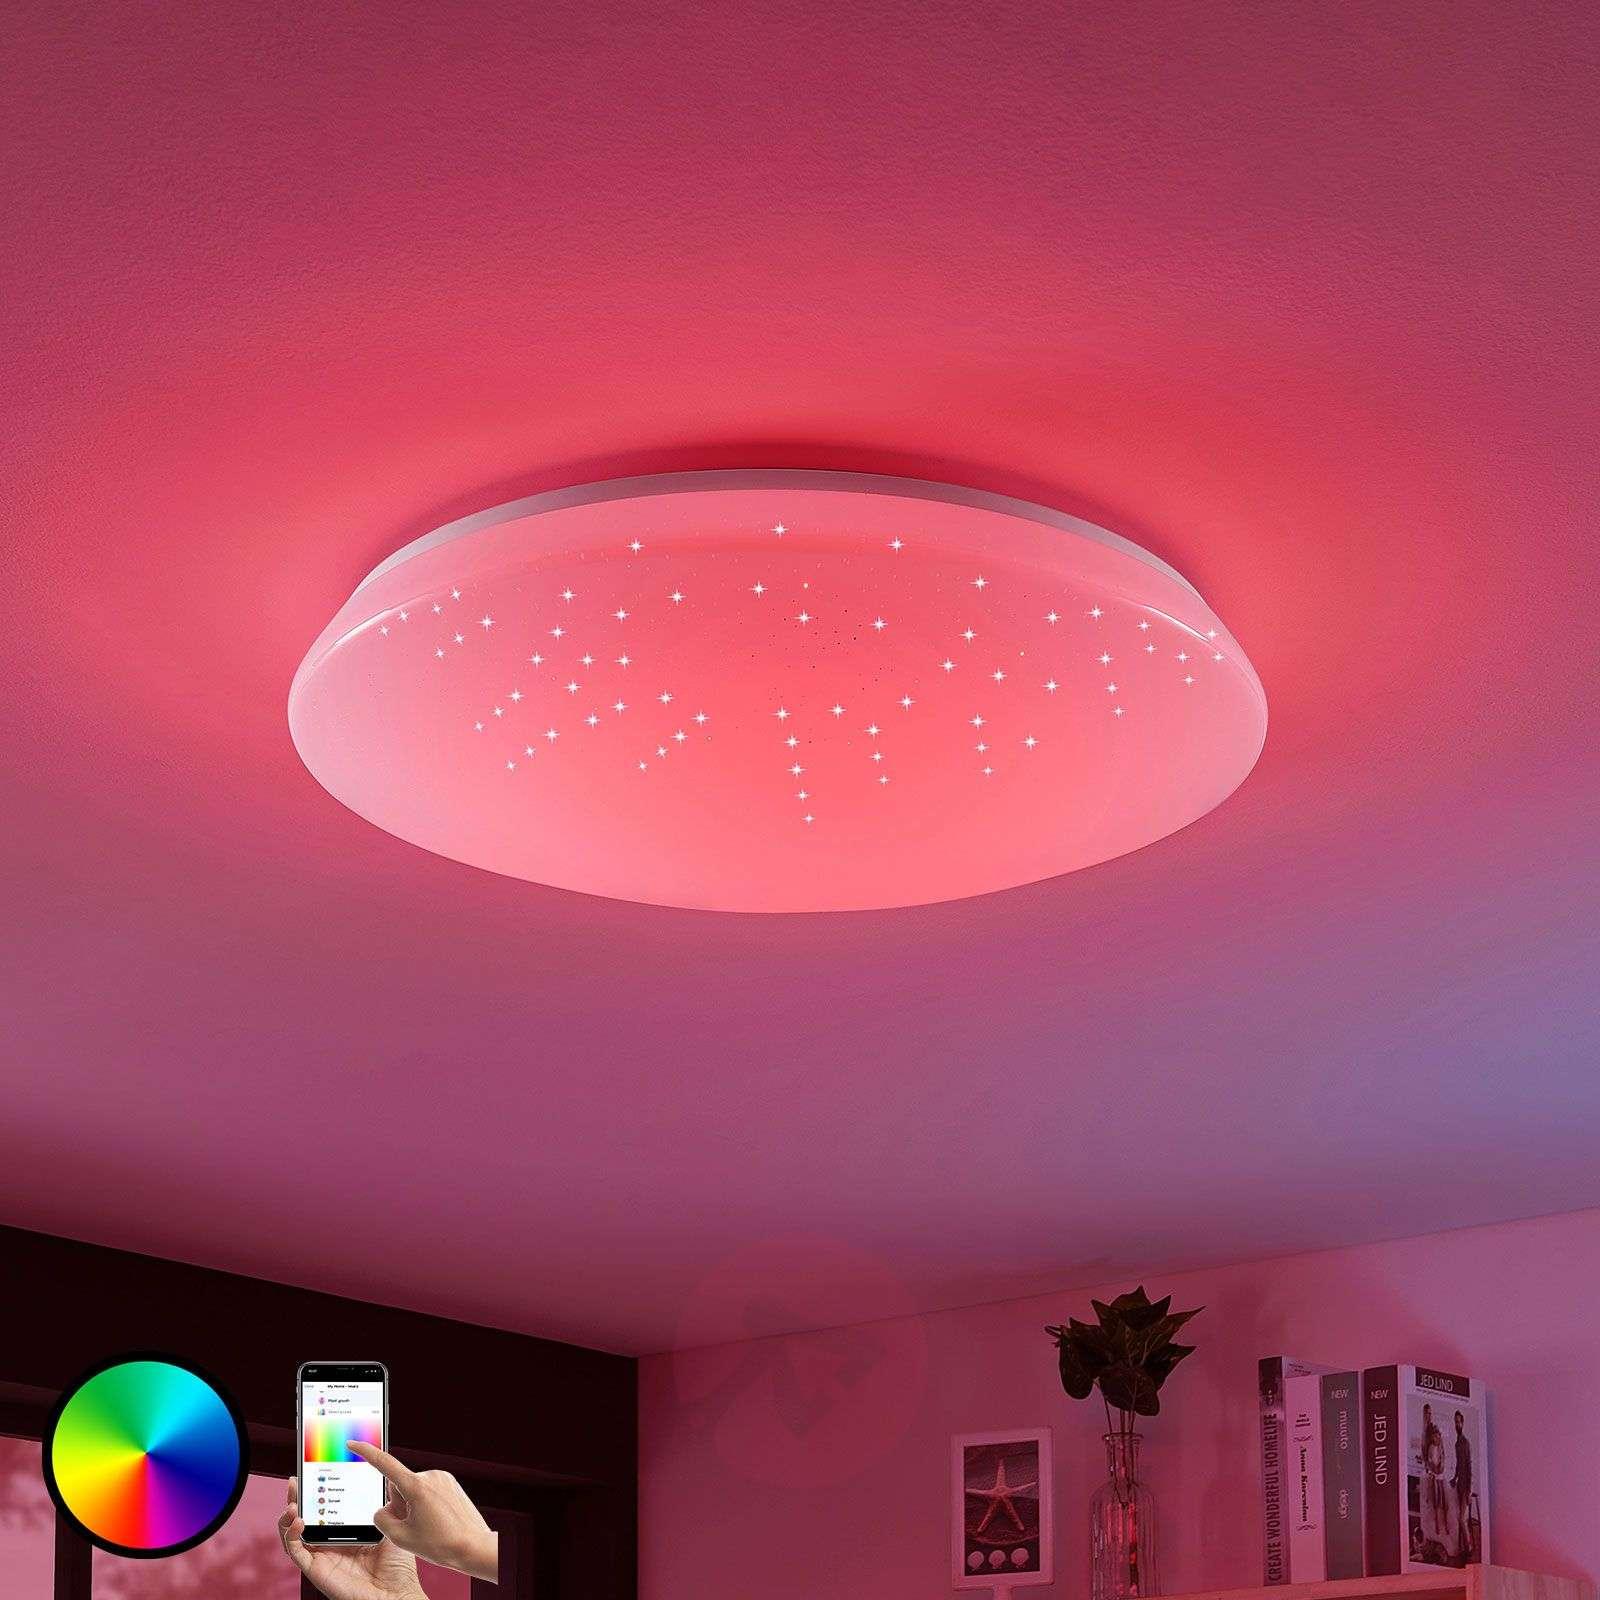 LED-kattolamppu Jelka, WiZ, RGBW-värin vaihto-8032184-02